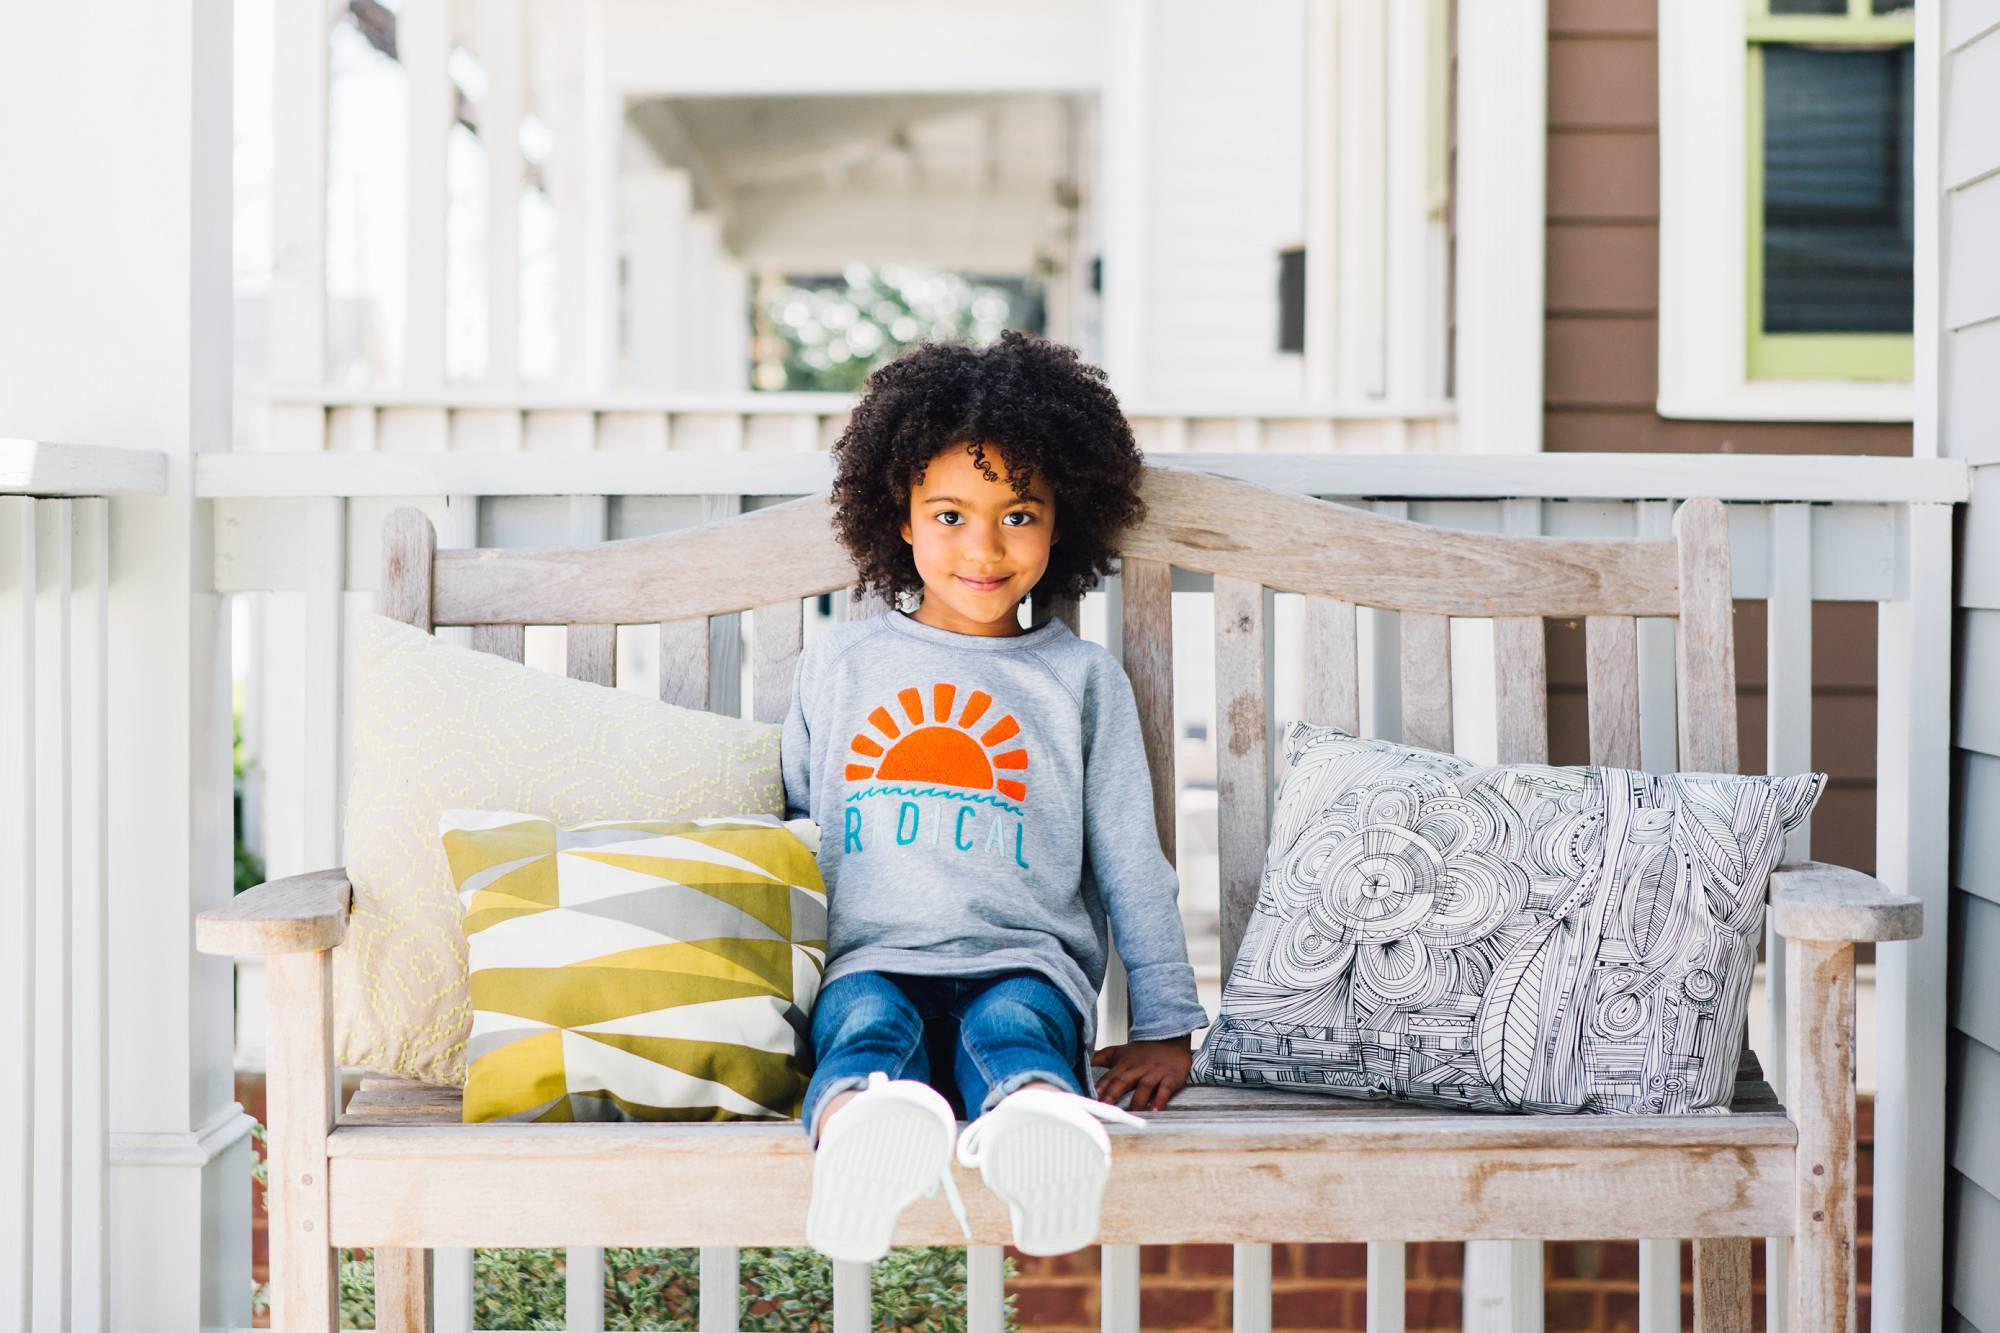 lifestyle photographer commercial   children model porch